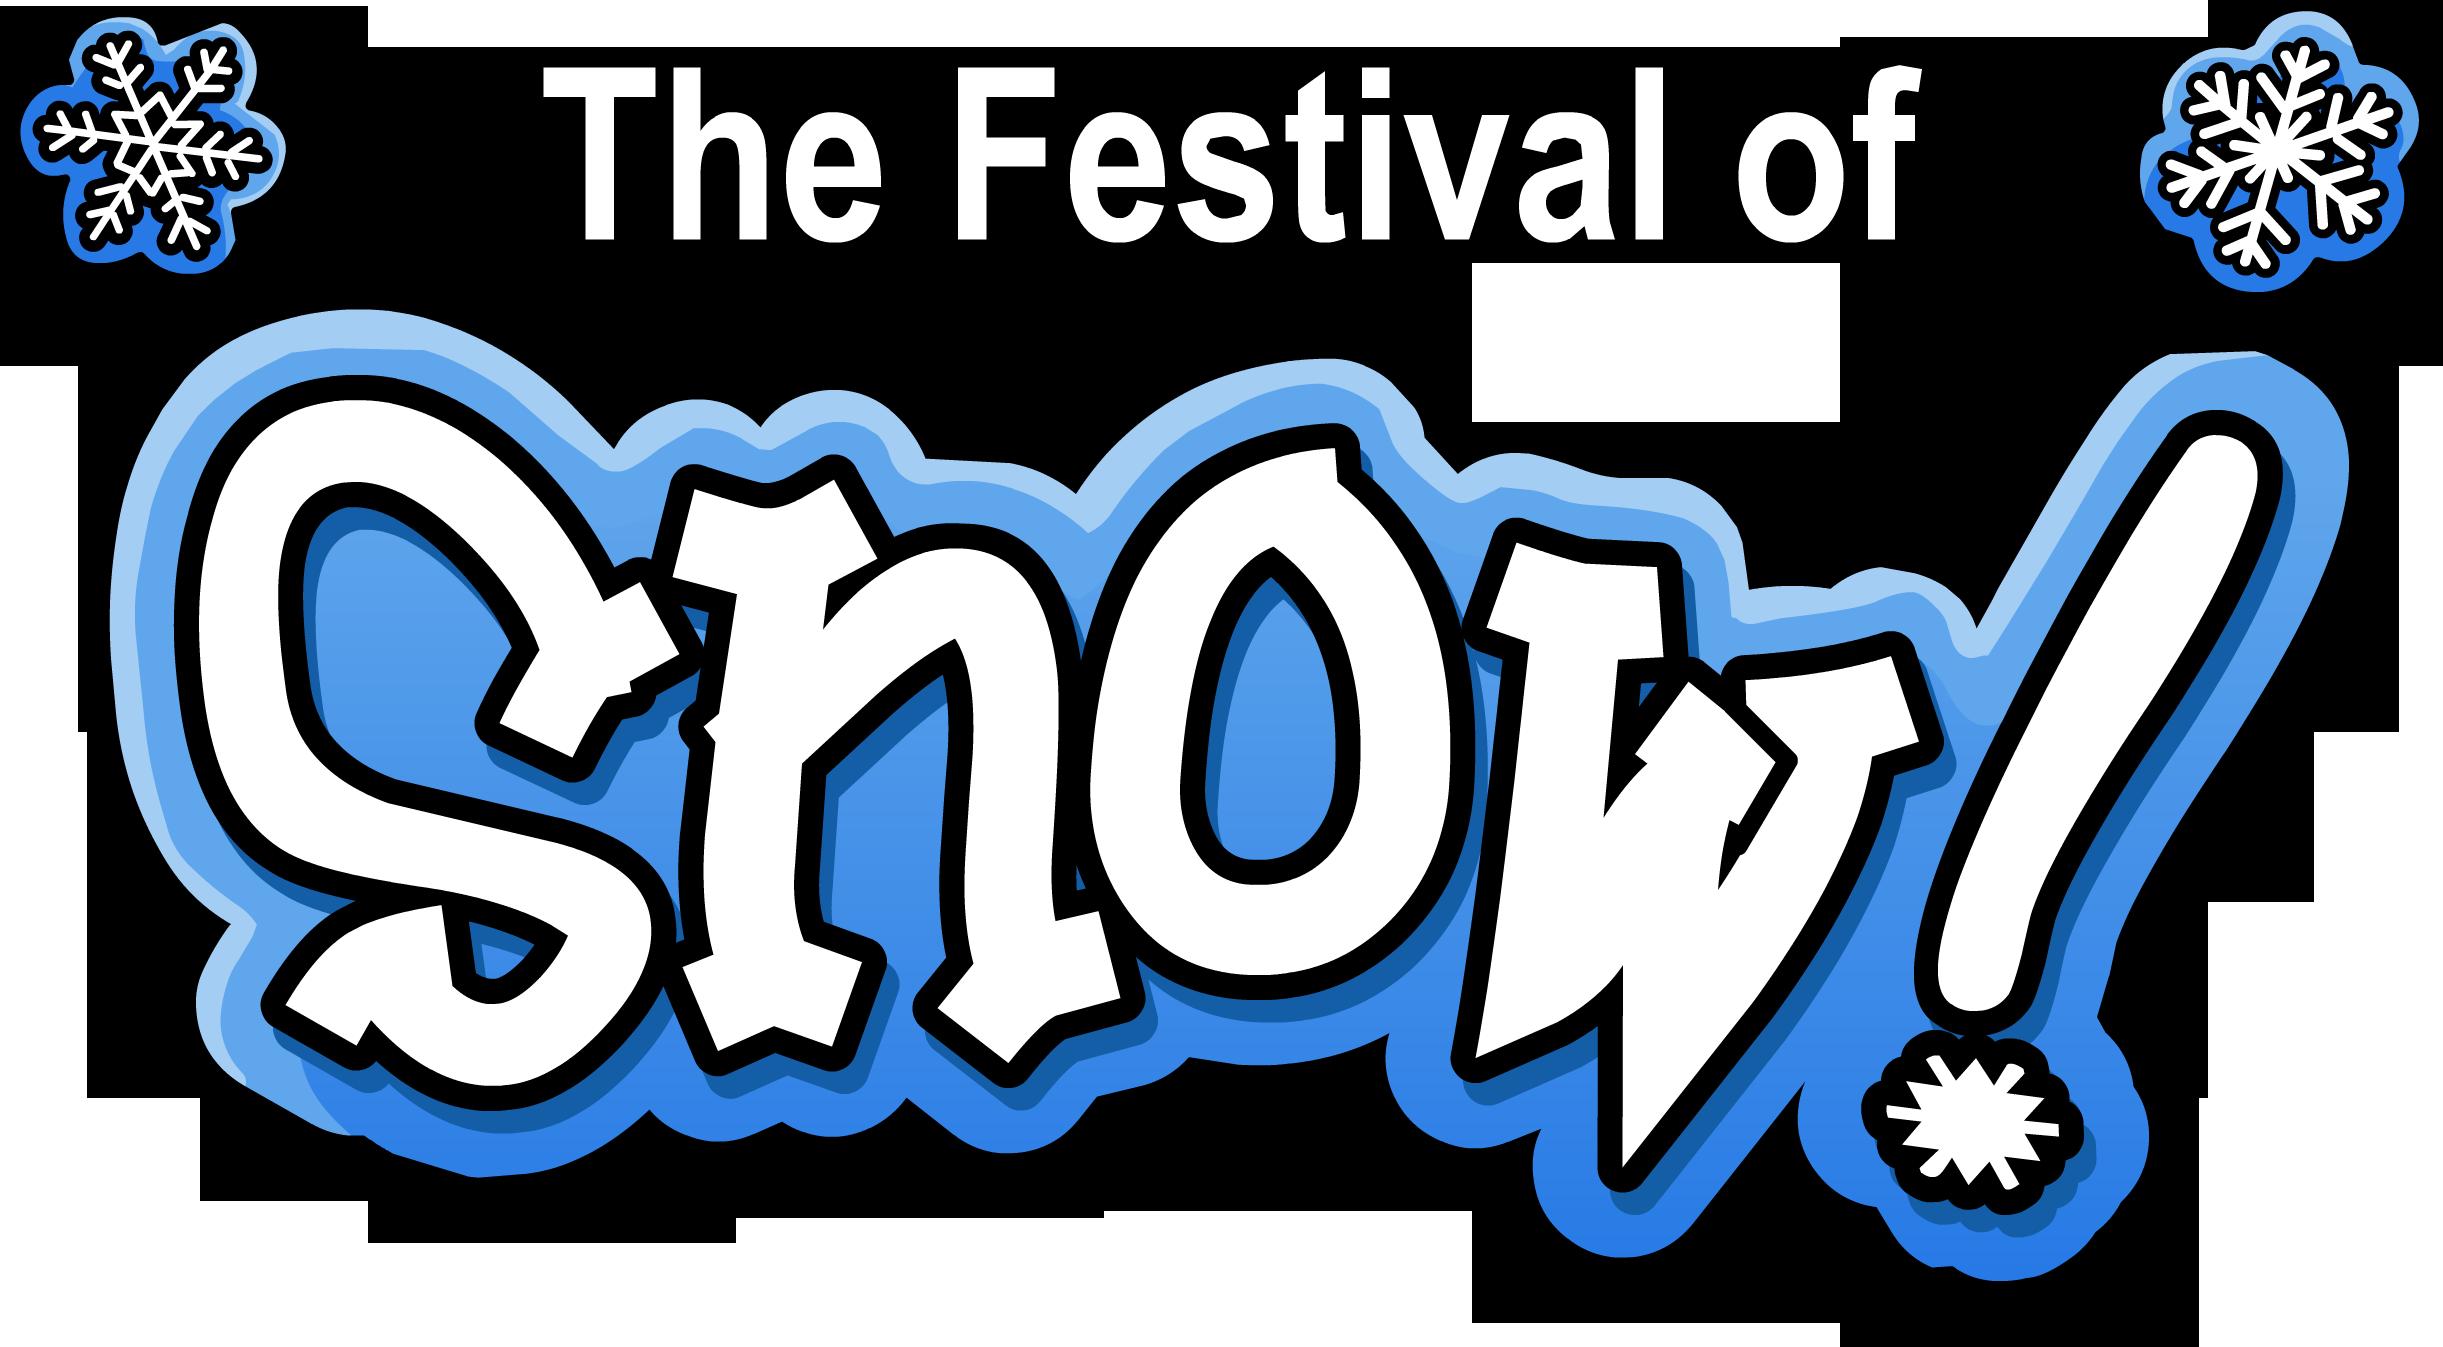 Festival de Nieve 2007